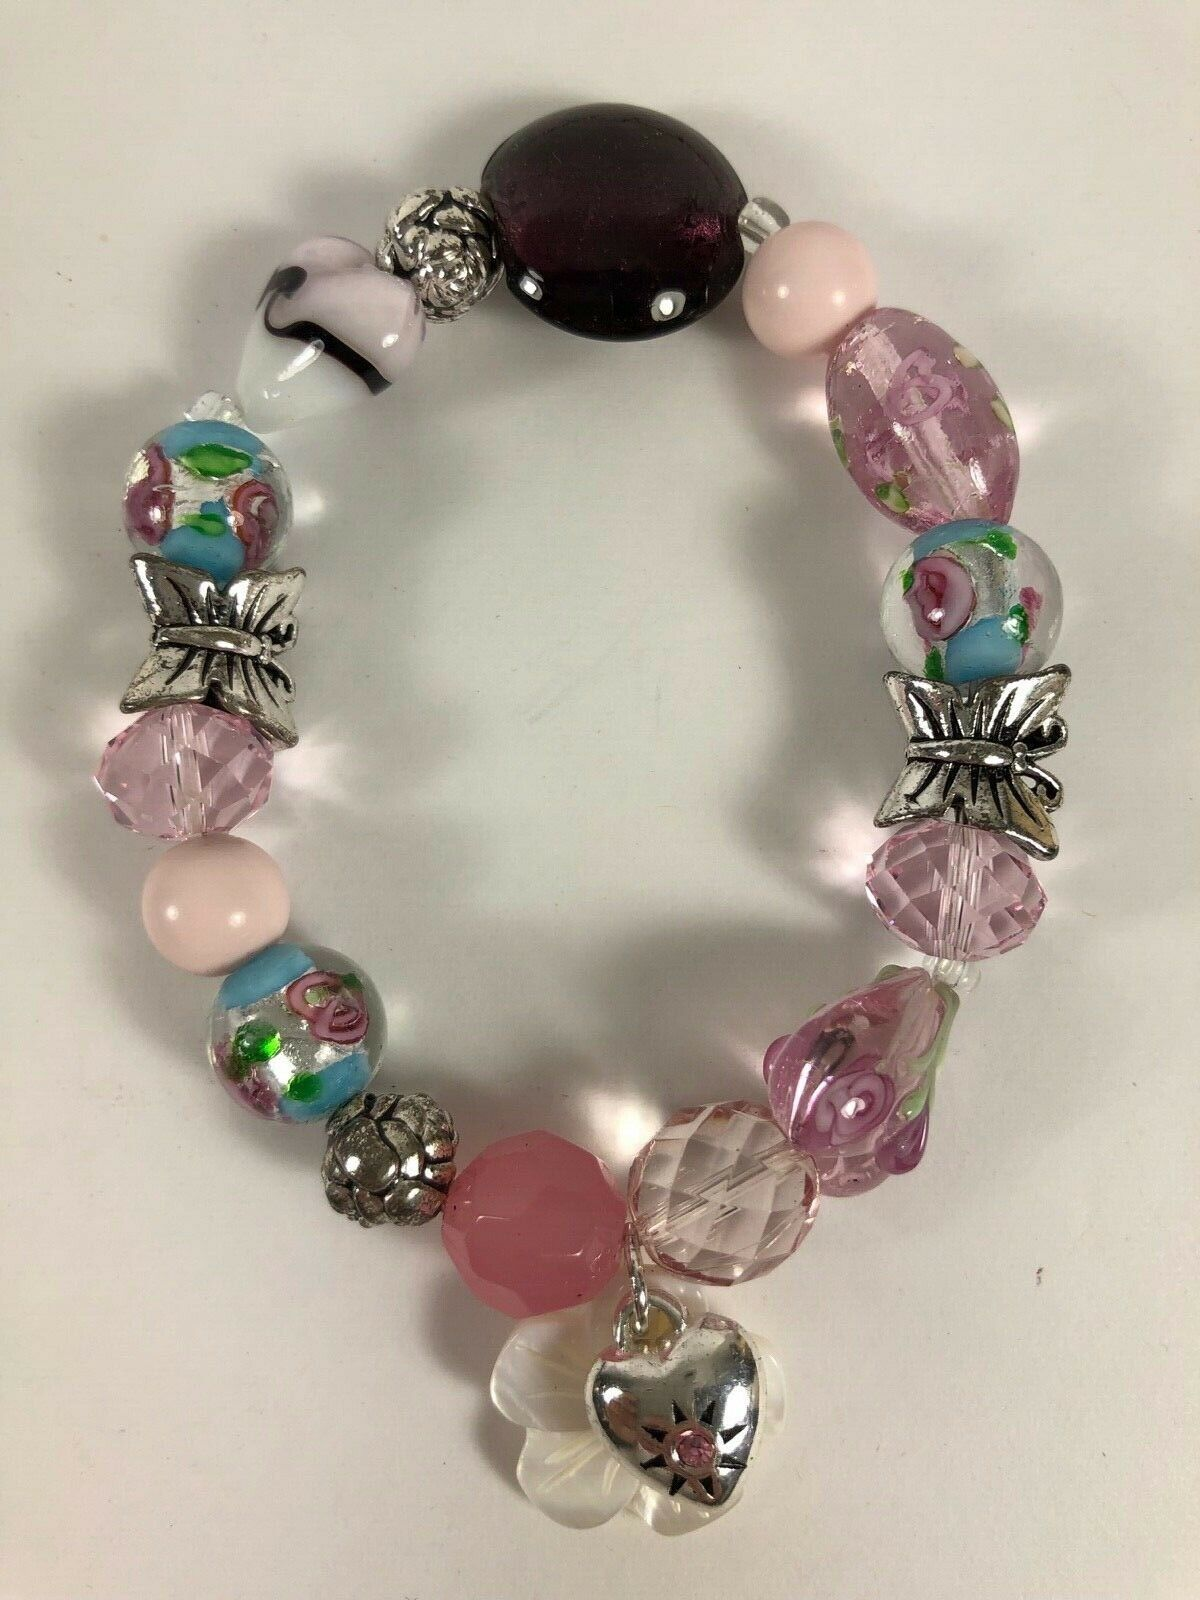 New AVON 2010 Beaded Floral Mop Arts Glass Silver Butterfly Stretch Bracelet